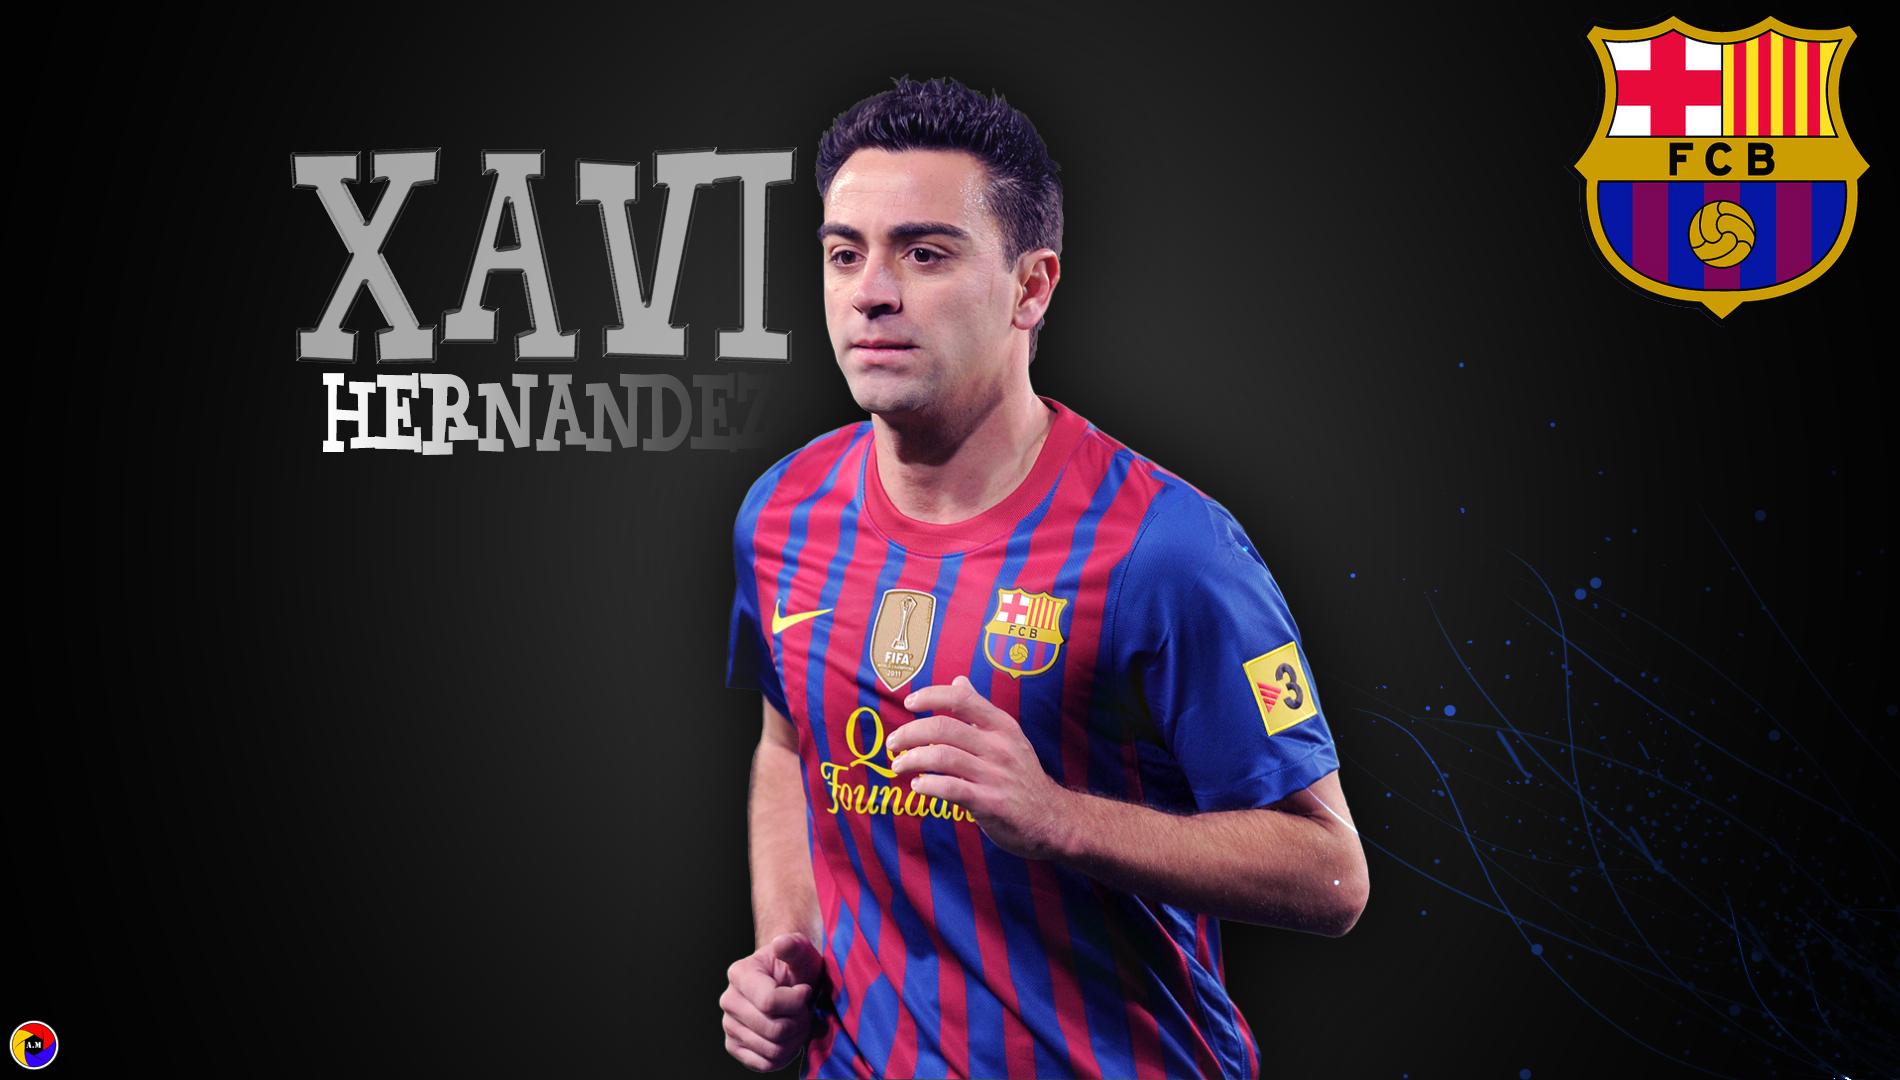 Wallpaper Xavi Hernandez FCB 1900x1080